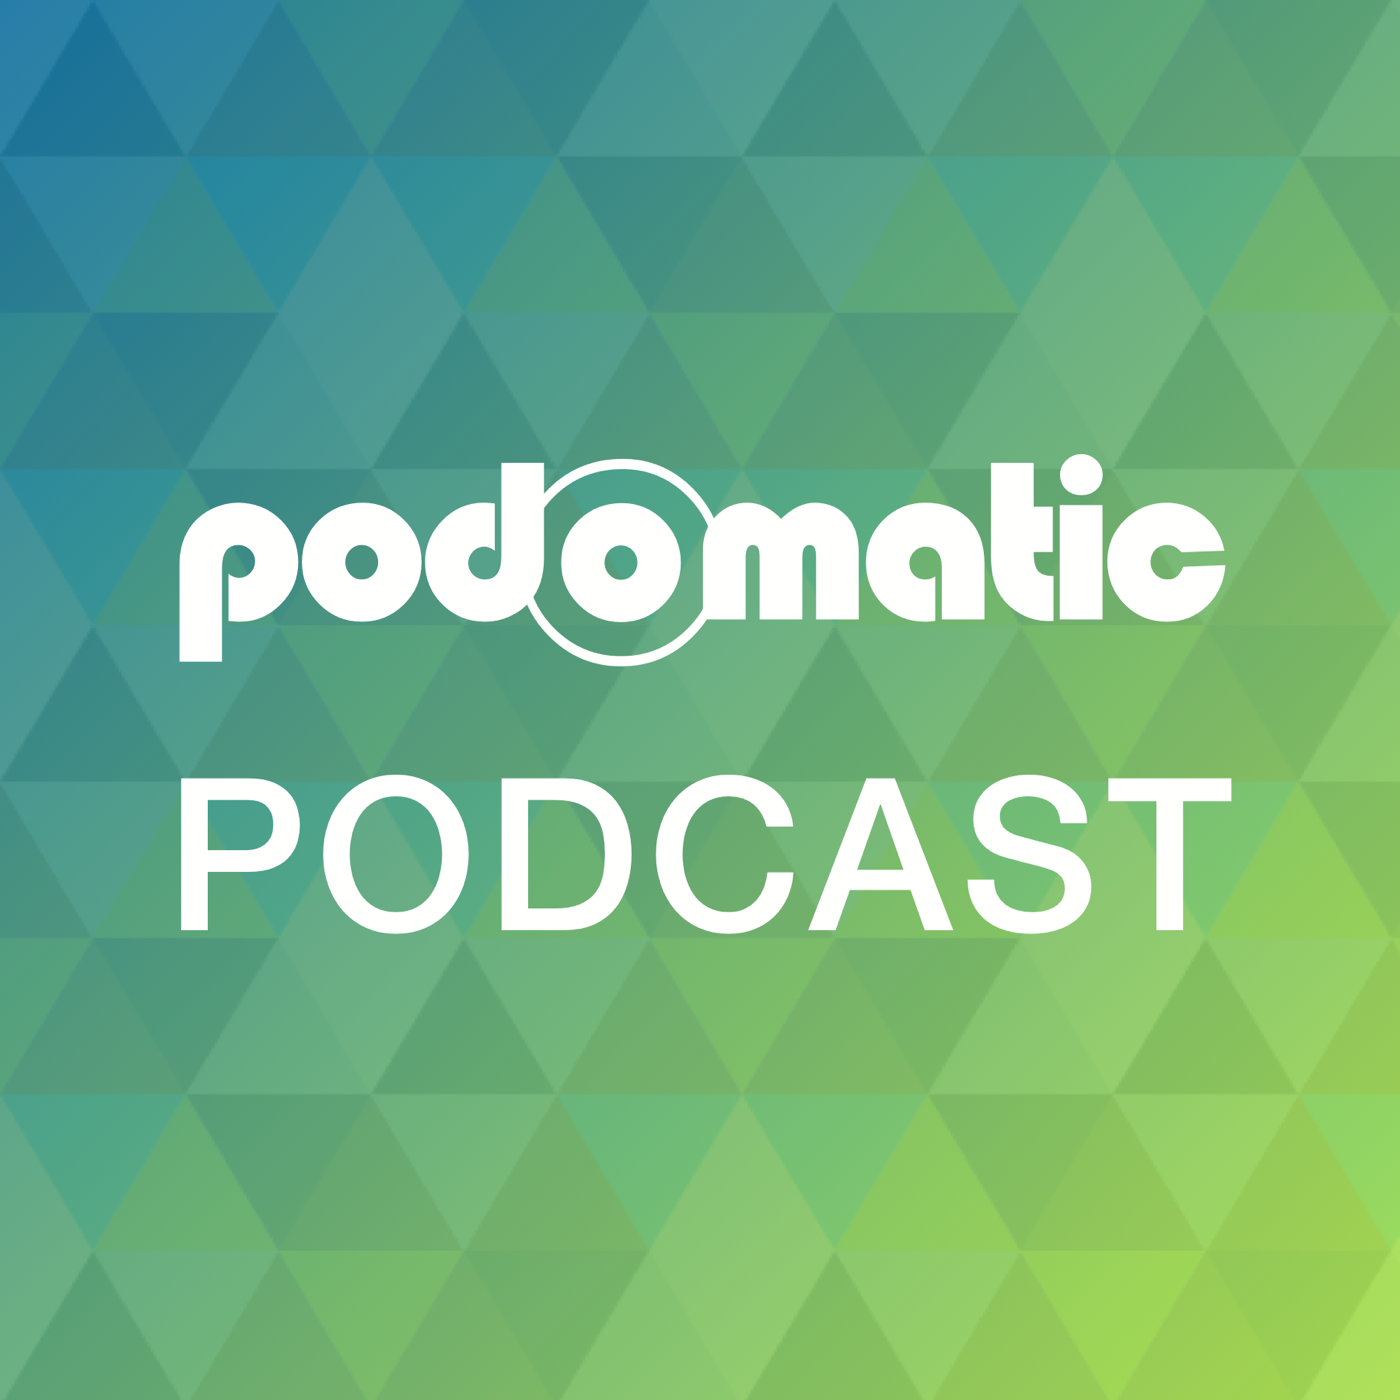 Paul Rando's Podcast